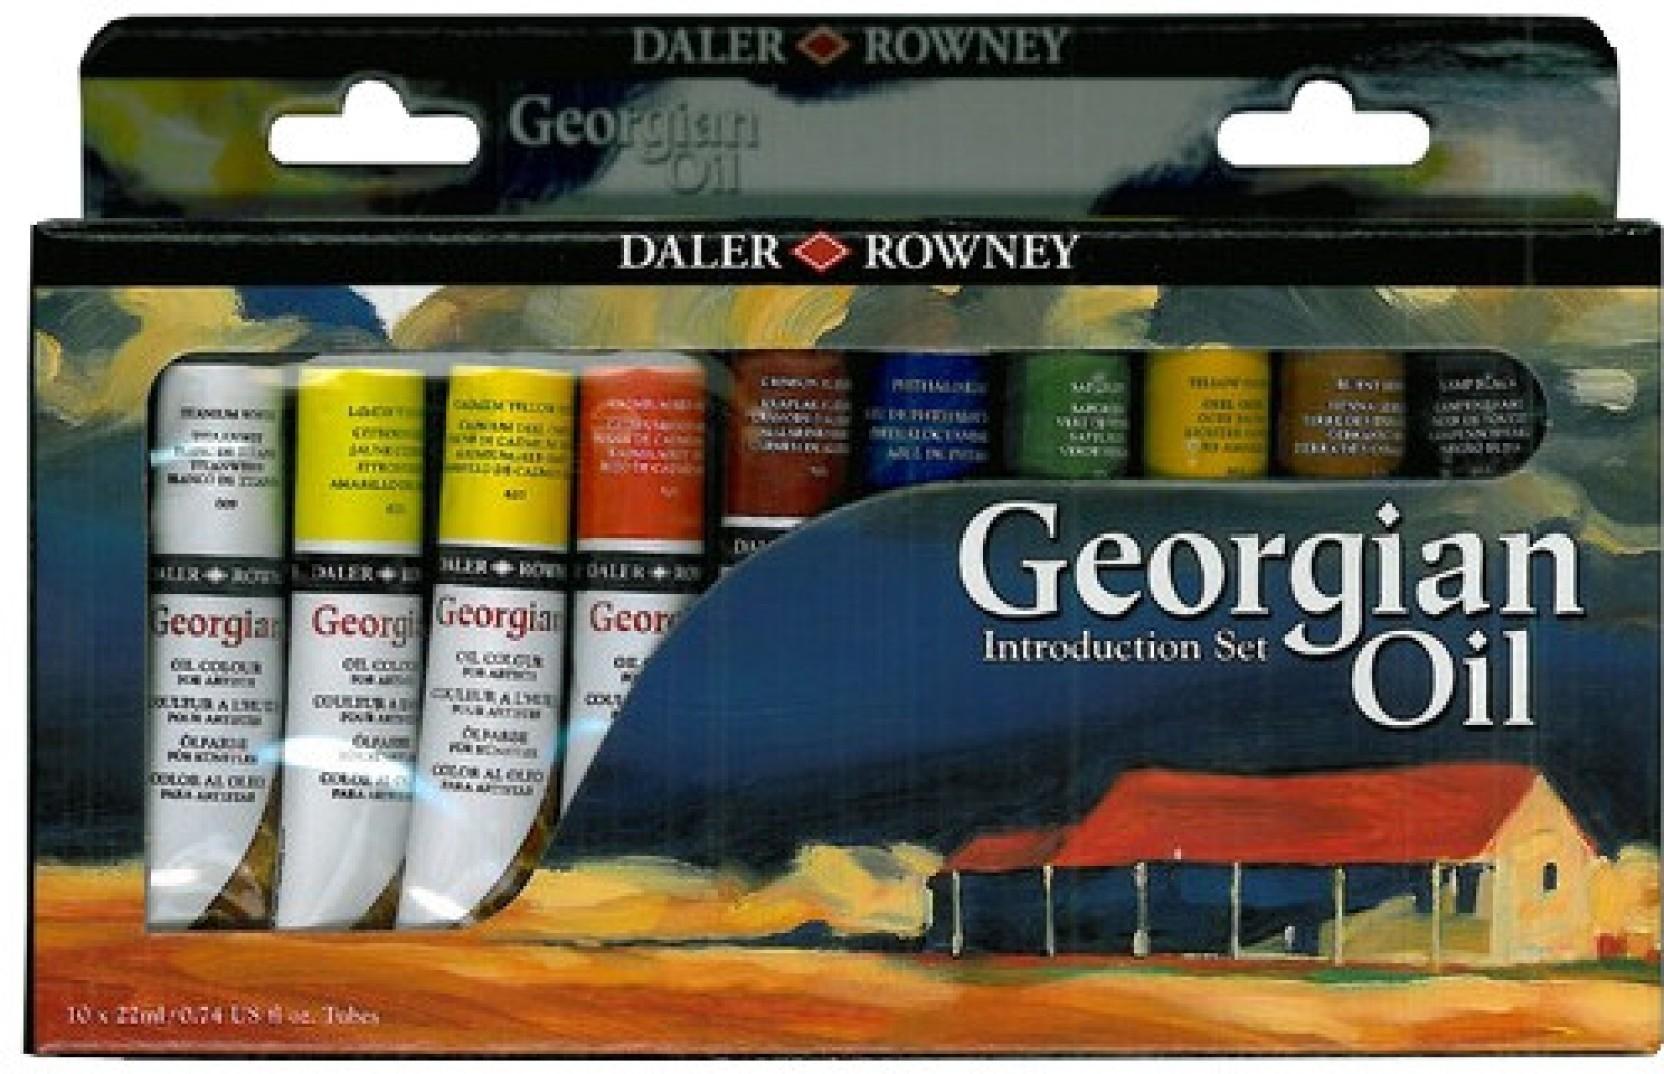 Daler rowney georgian oil paint for Oil paint price